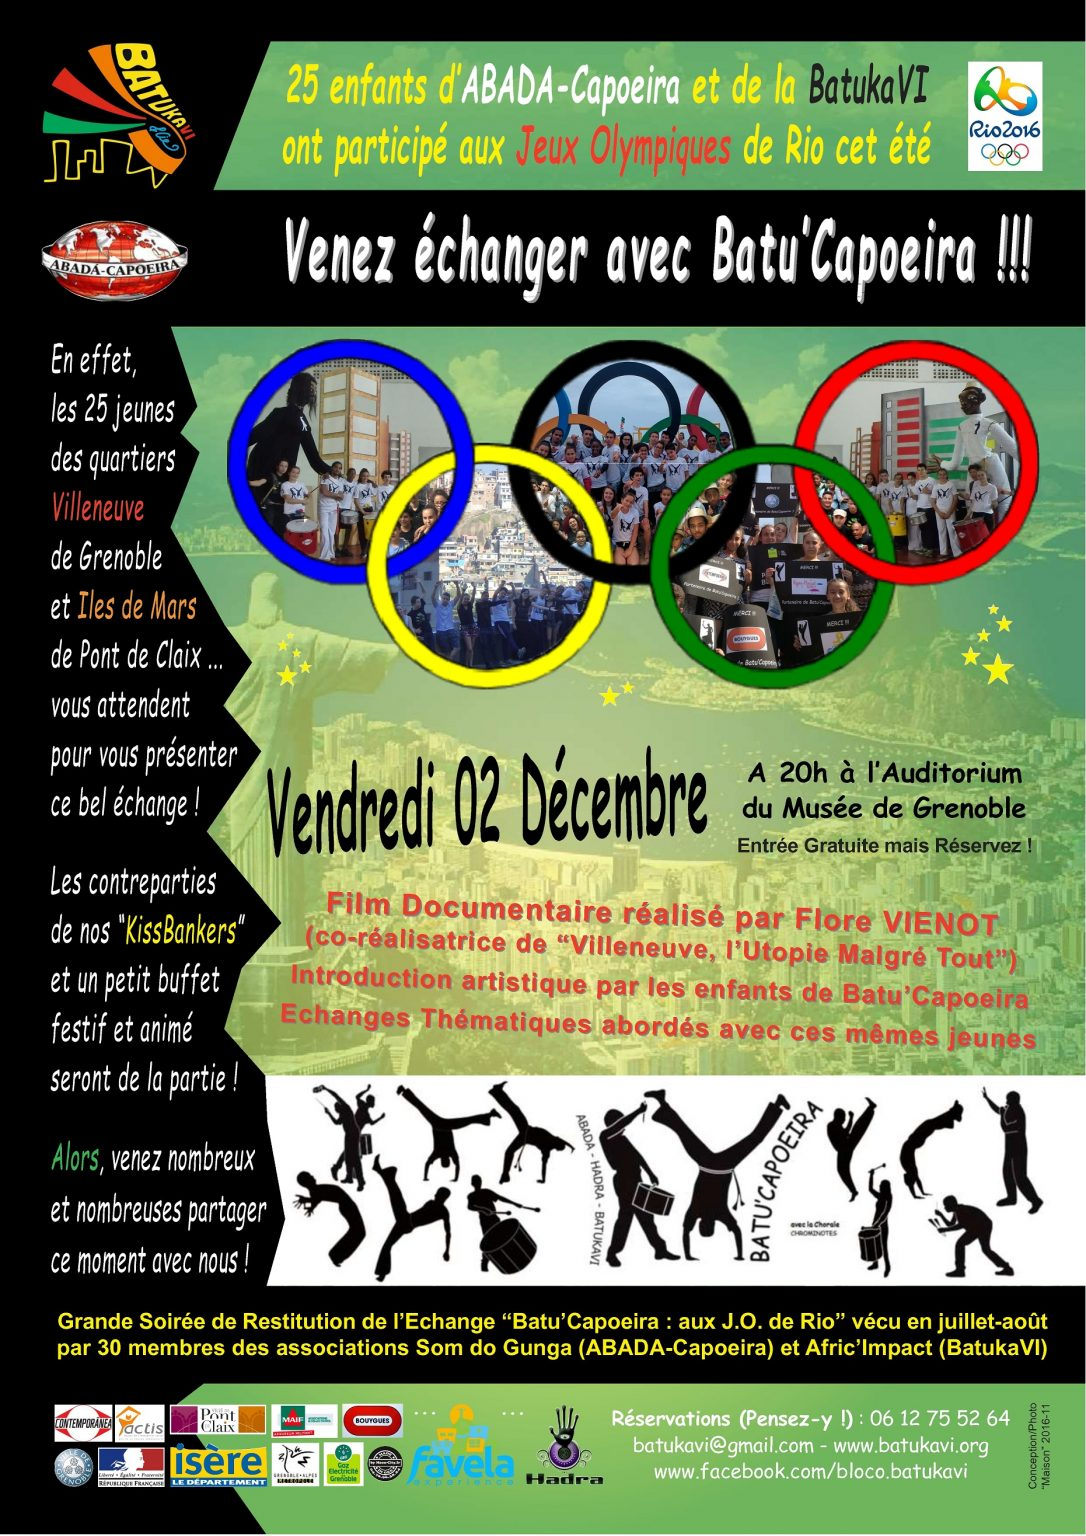 2016-12-02 Batu'Capoeira - Soirée de Restitution